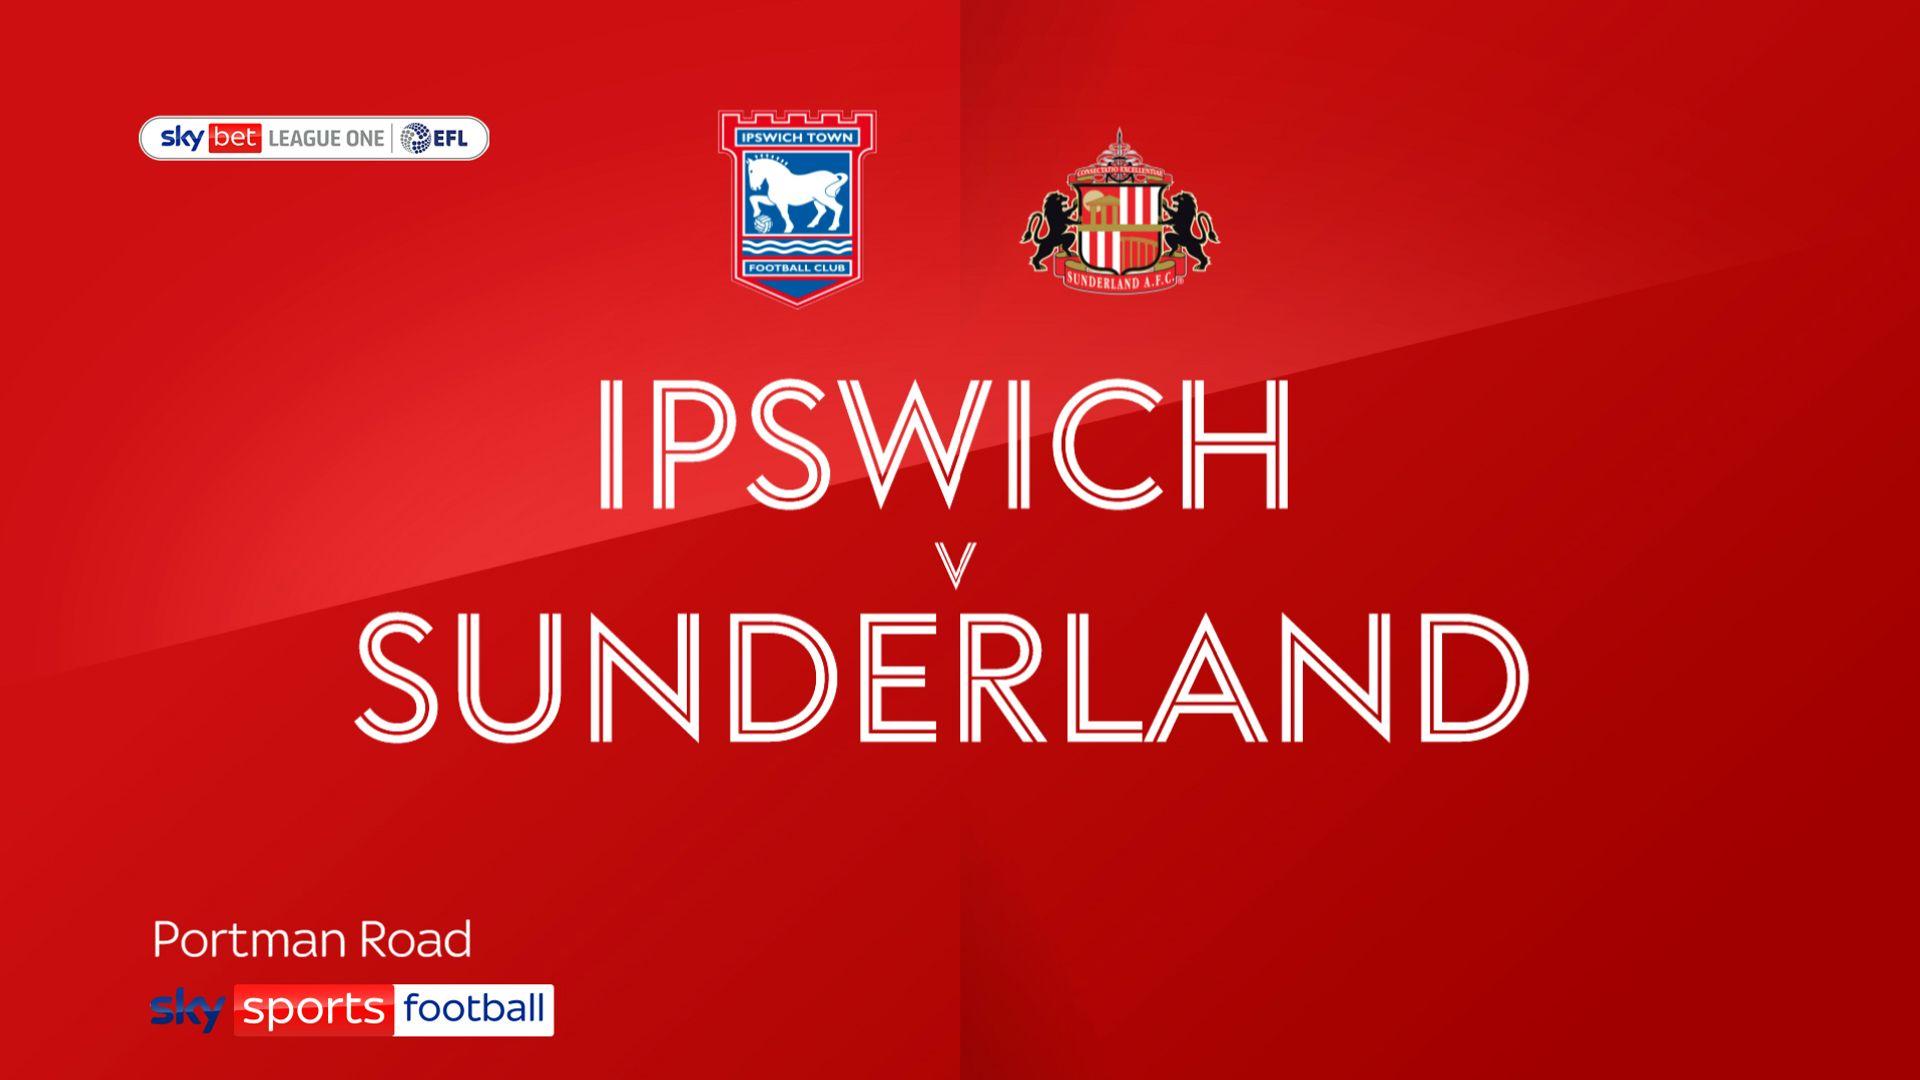 Wyke steers Sunderland past Ipswich